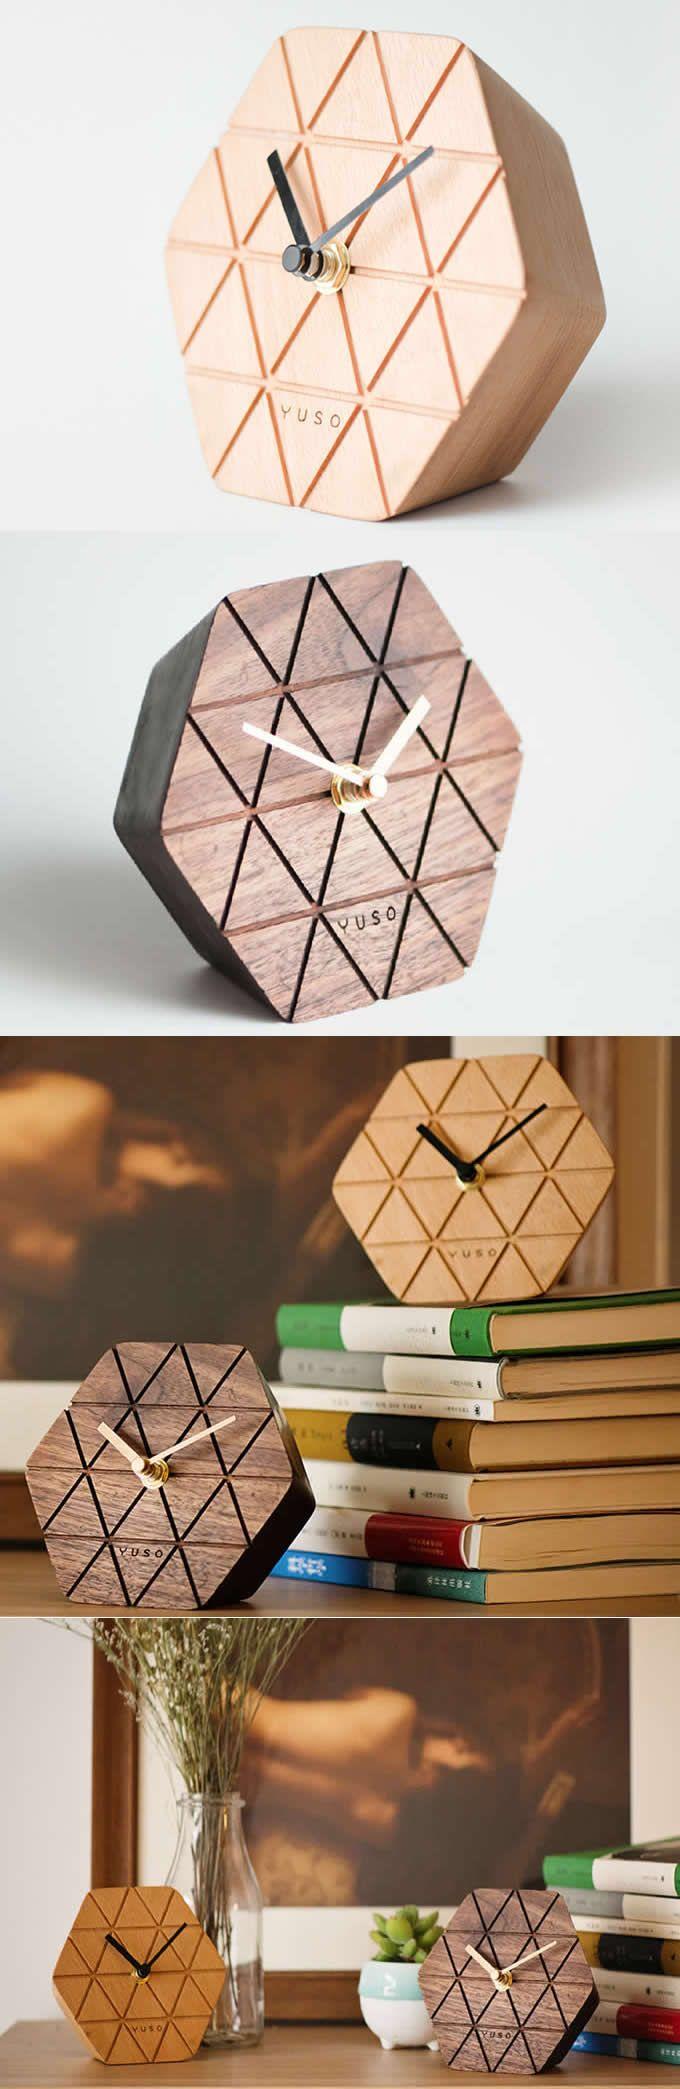 Handmade Beech Wood hexagonal Table Alarm Clock